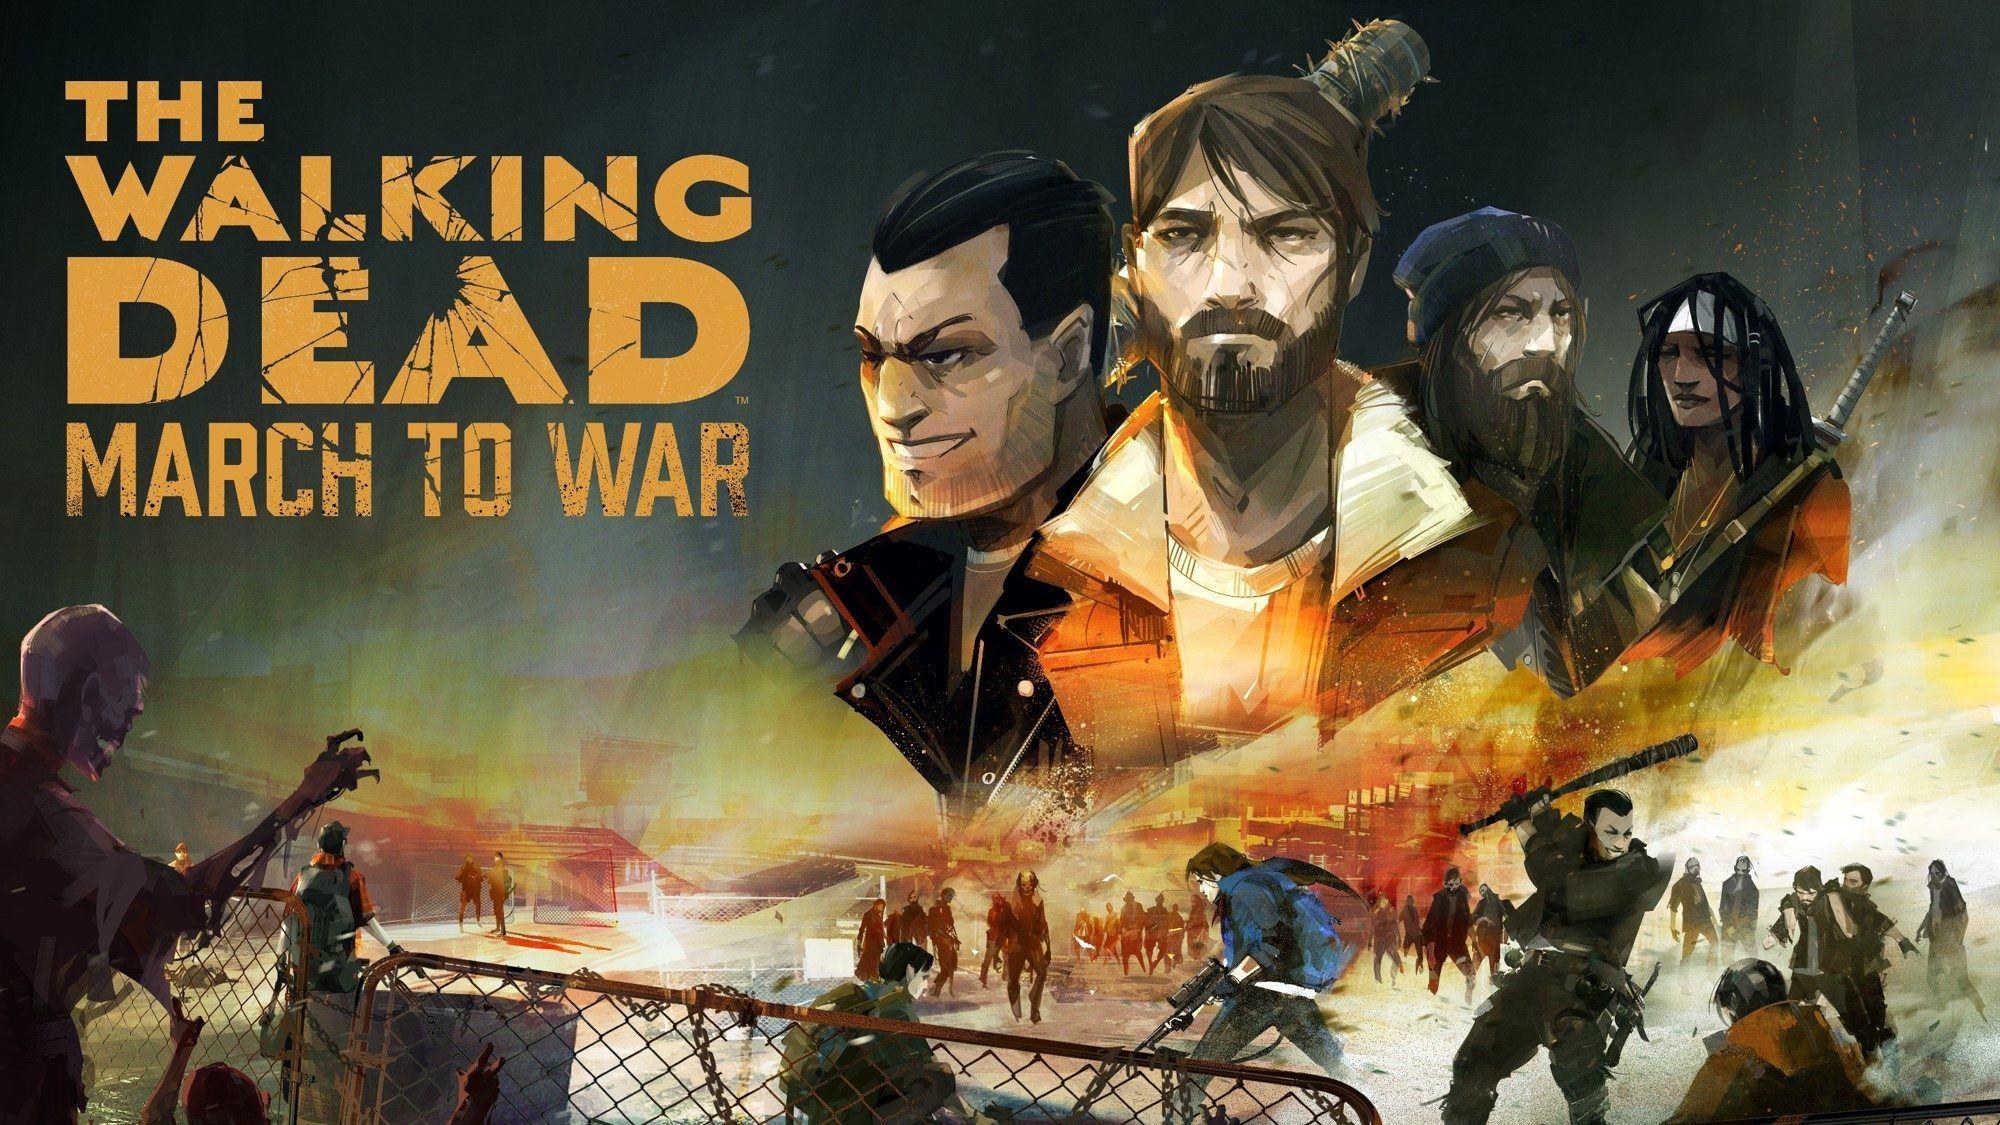 The Walking Dead March to War hack version download apk